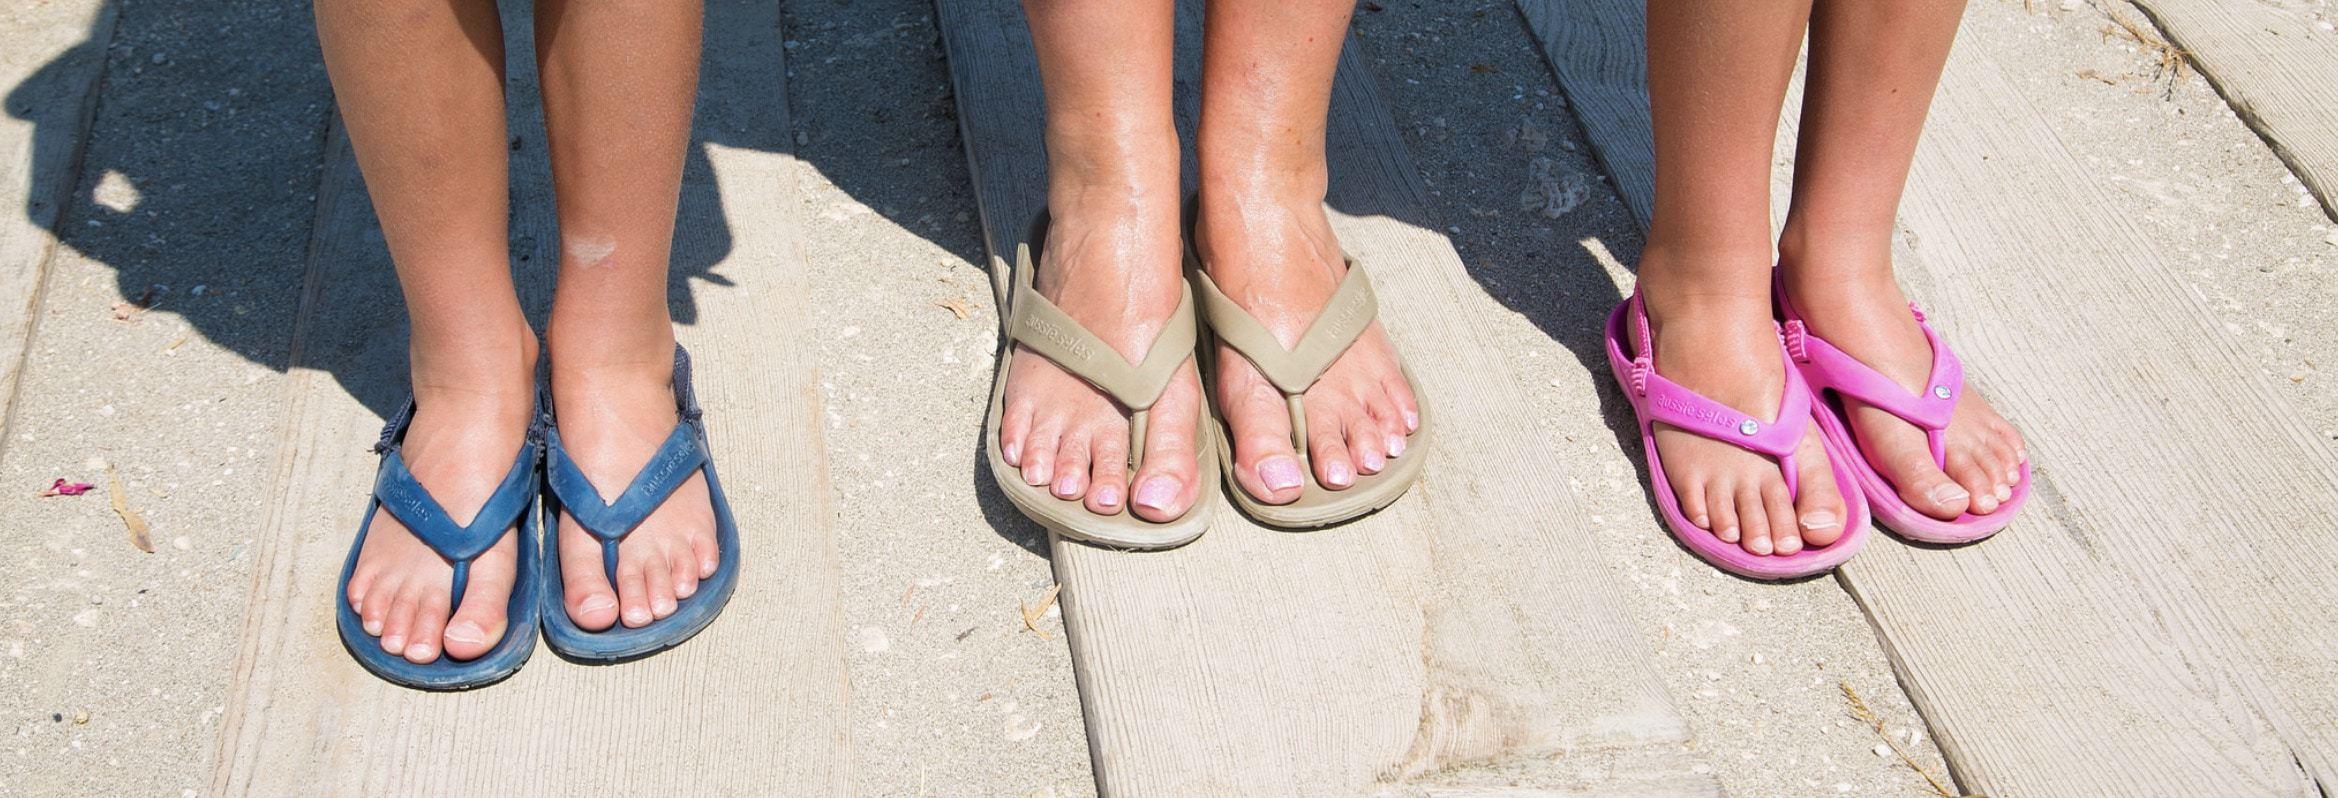 df73ad2408e782 Travel Tips  Aussie Soles UK - Life is better in flip flops!